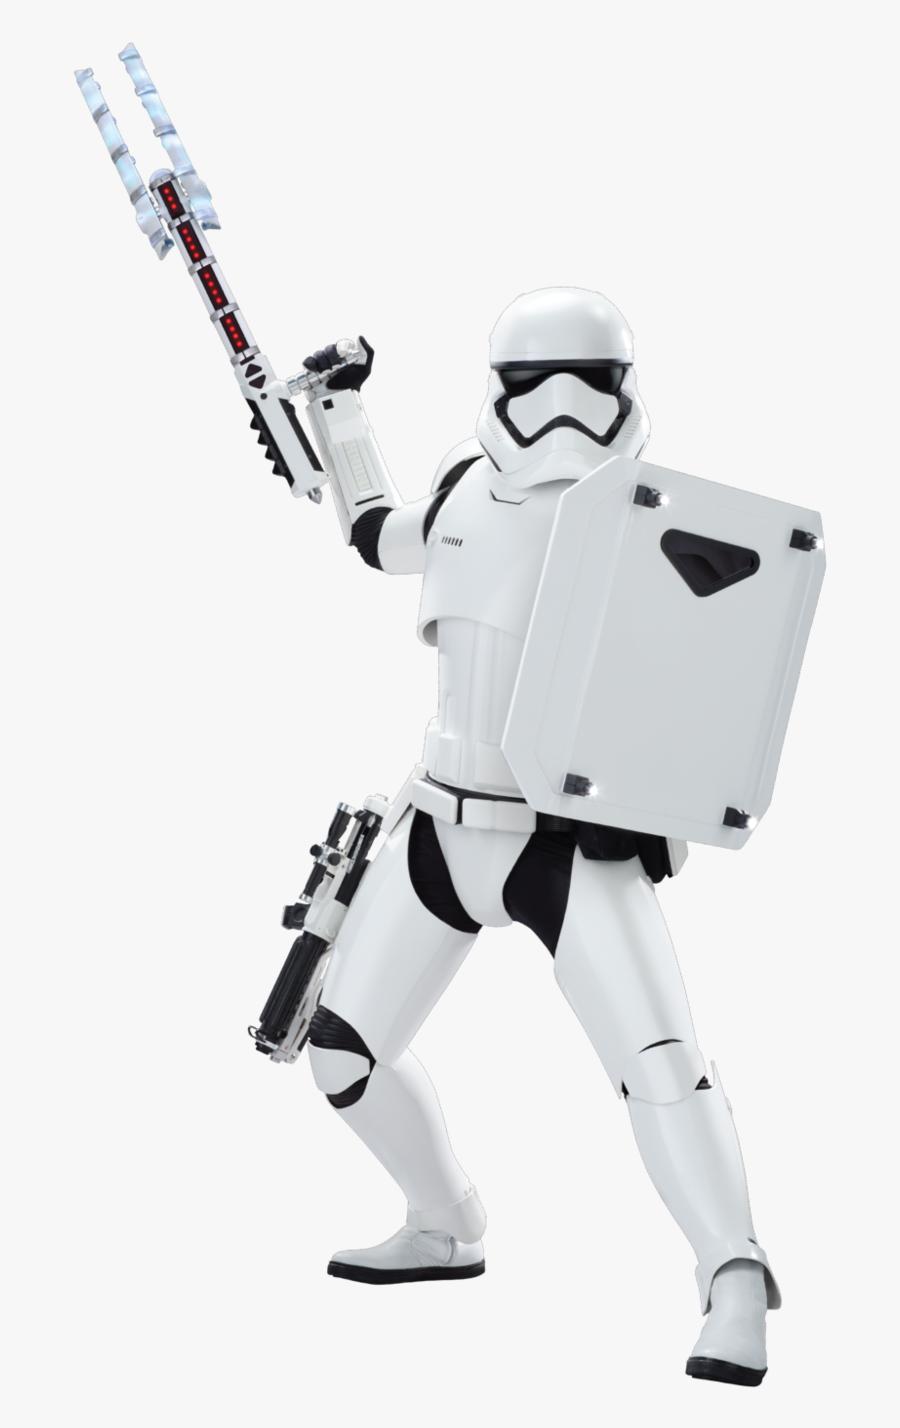 Transparent Storm Trooper Clipart - First Order Riot Control Stormtrooper, Transparent Clipart